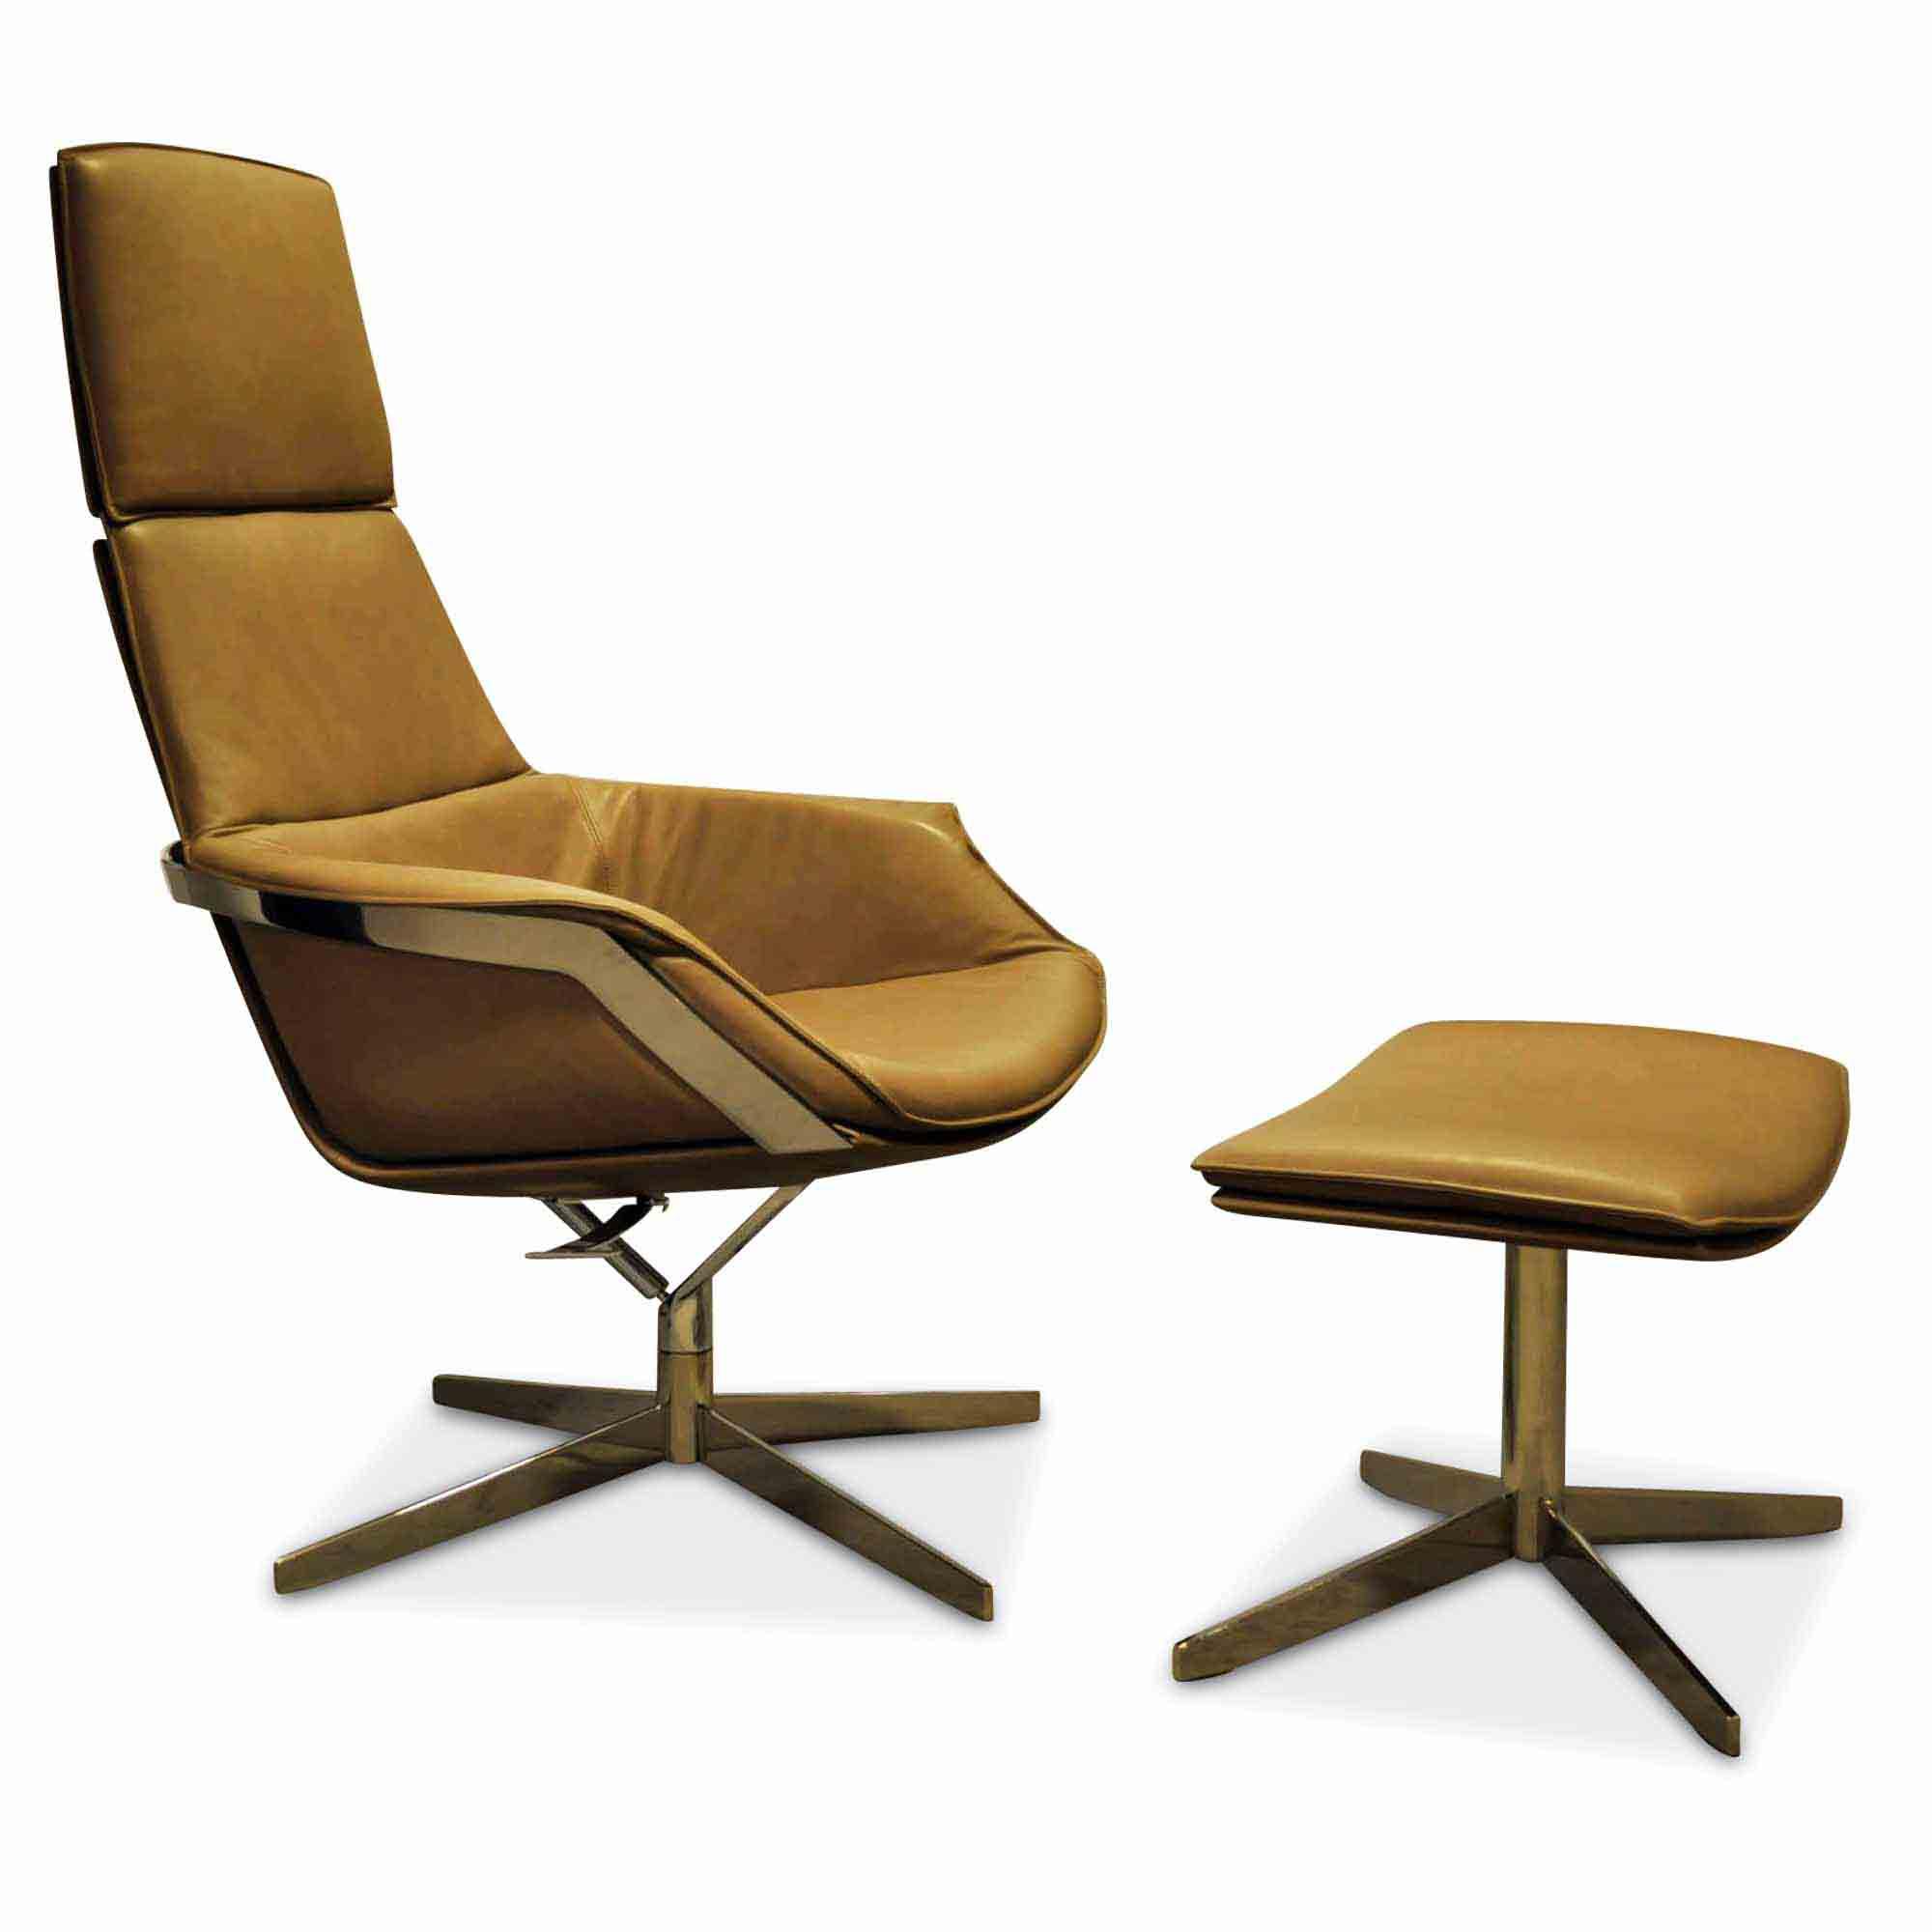 Ip Design Designer Sessel Bond Mit Hocker Leder Stahl Beige Braun